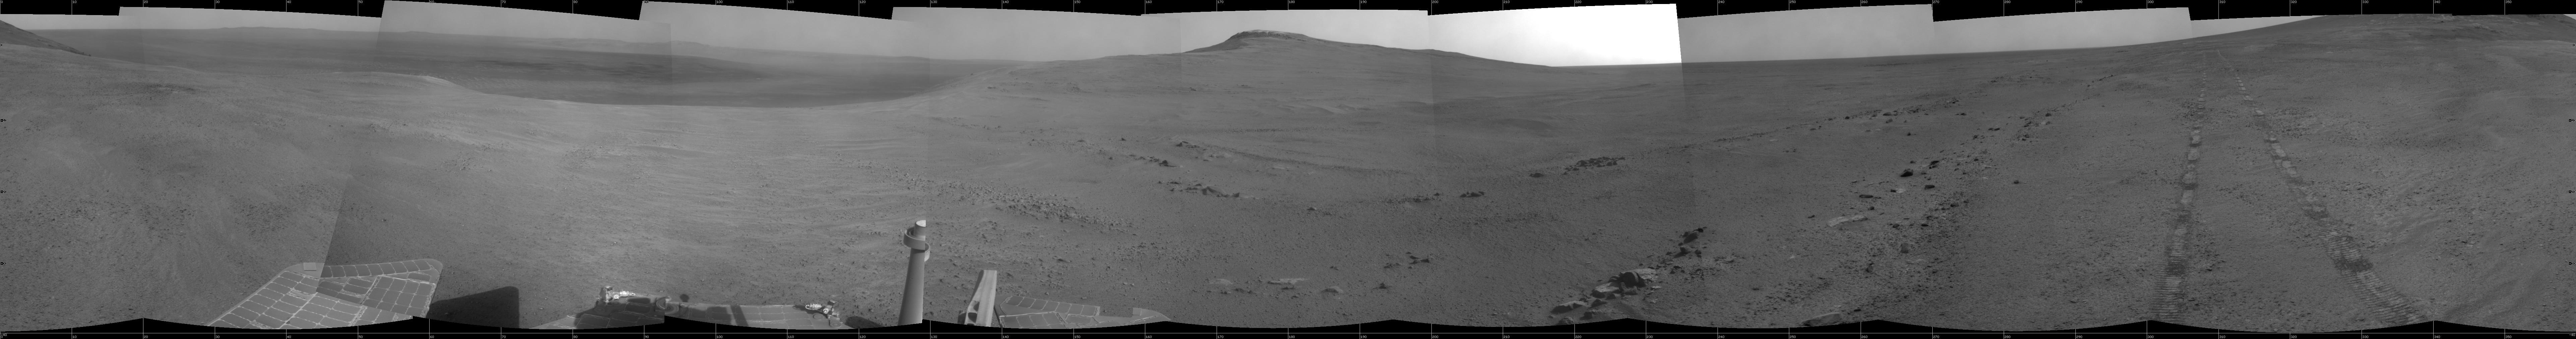 nasa lies about mars - photo #27